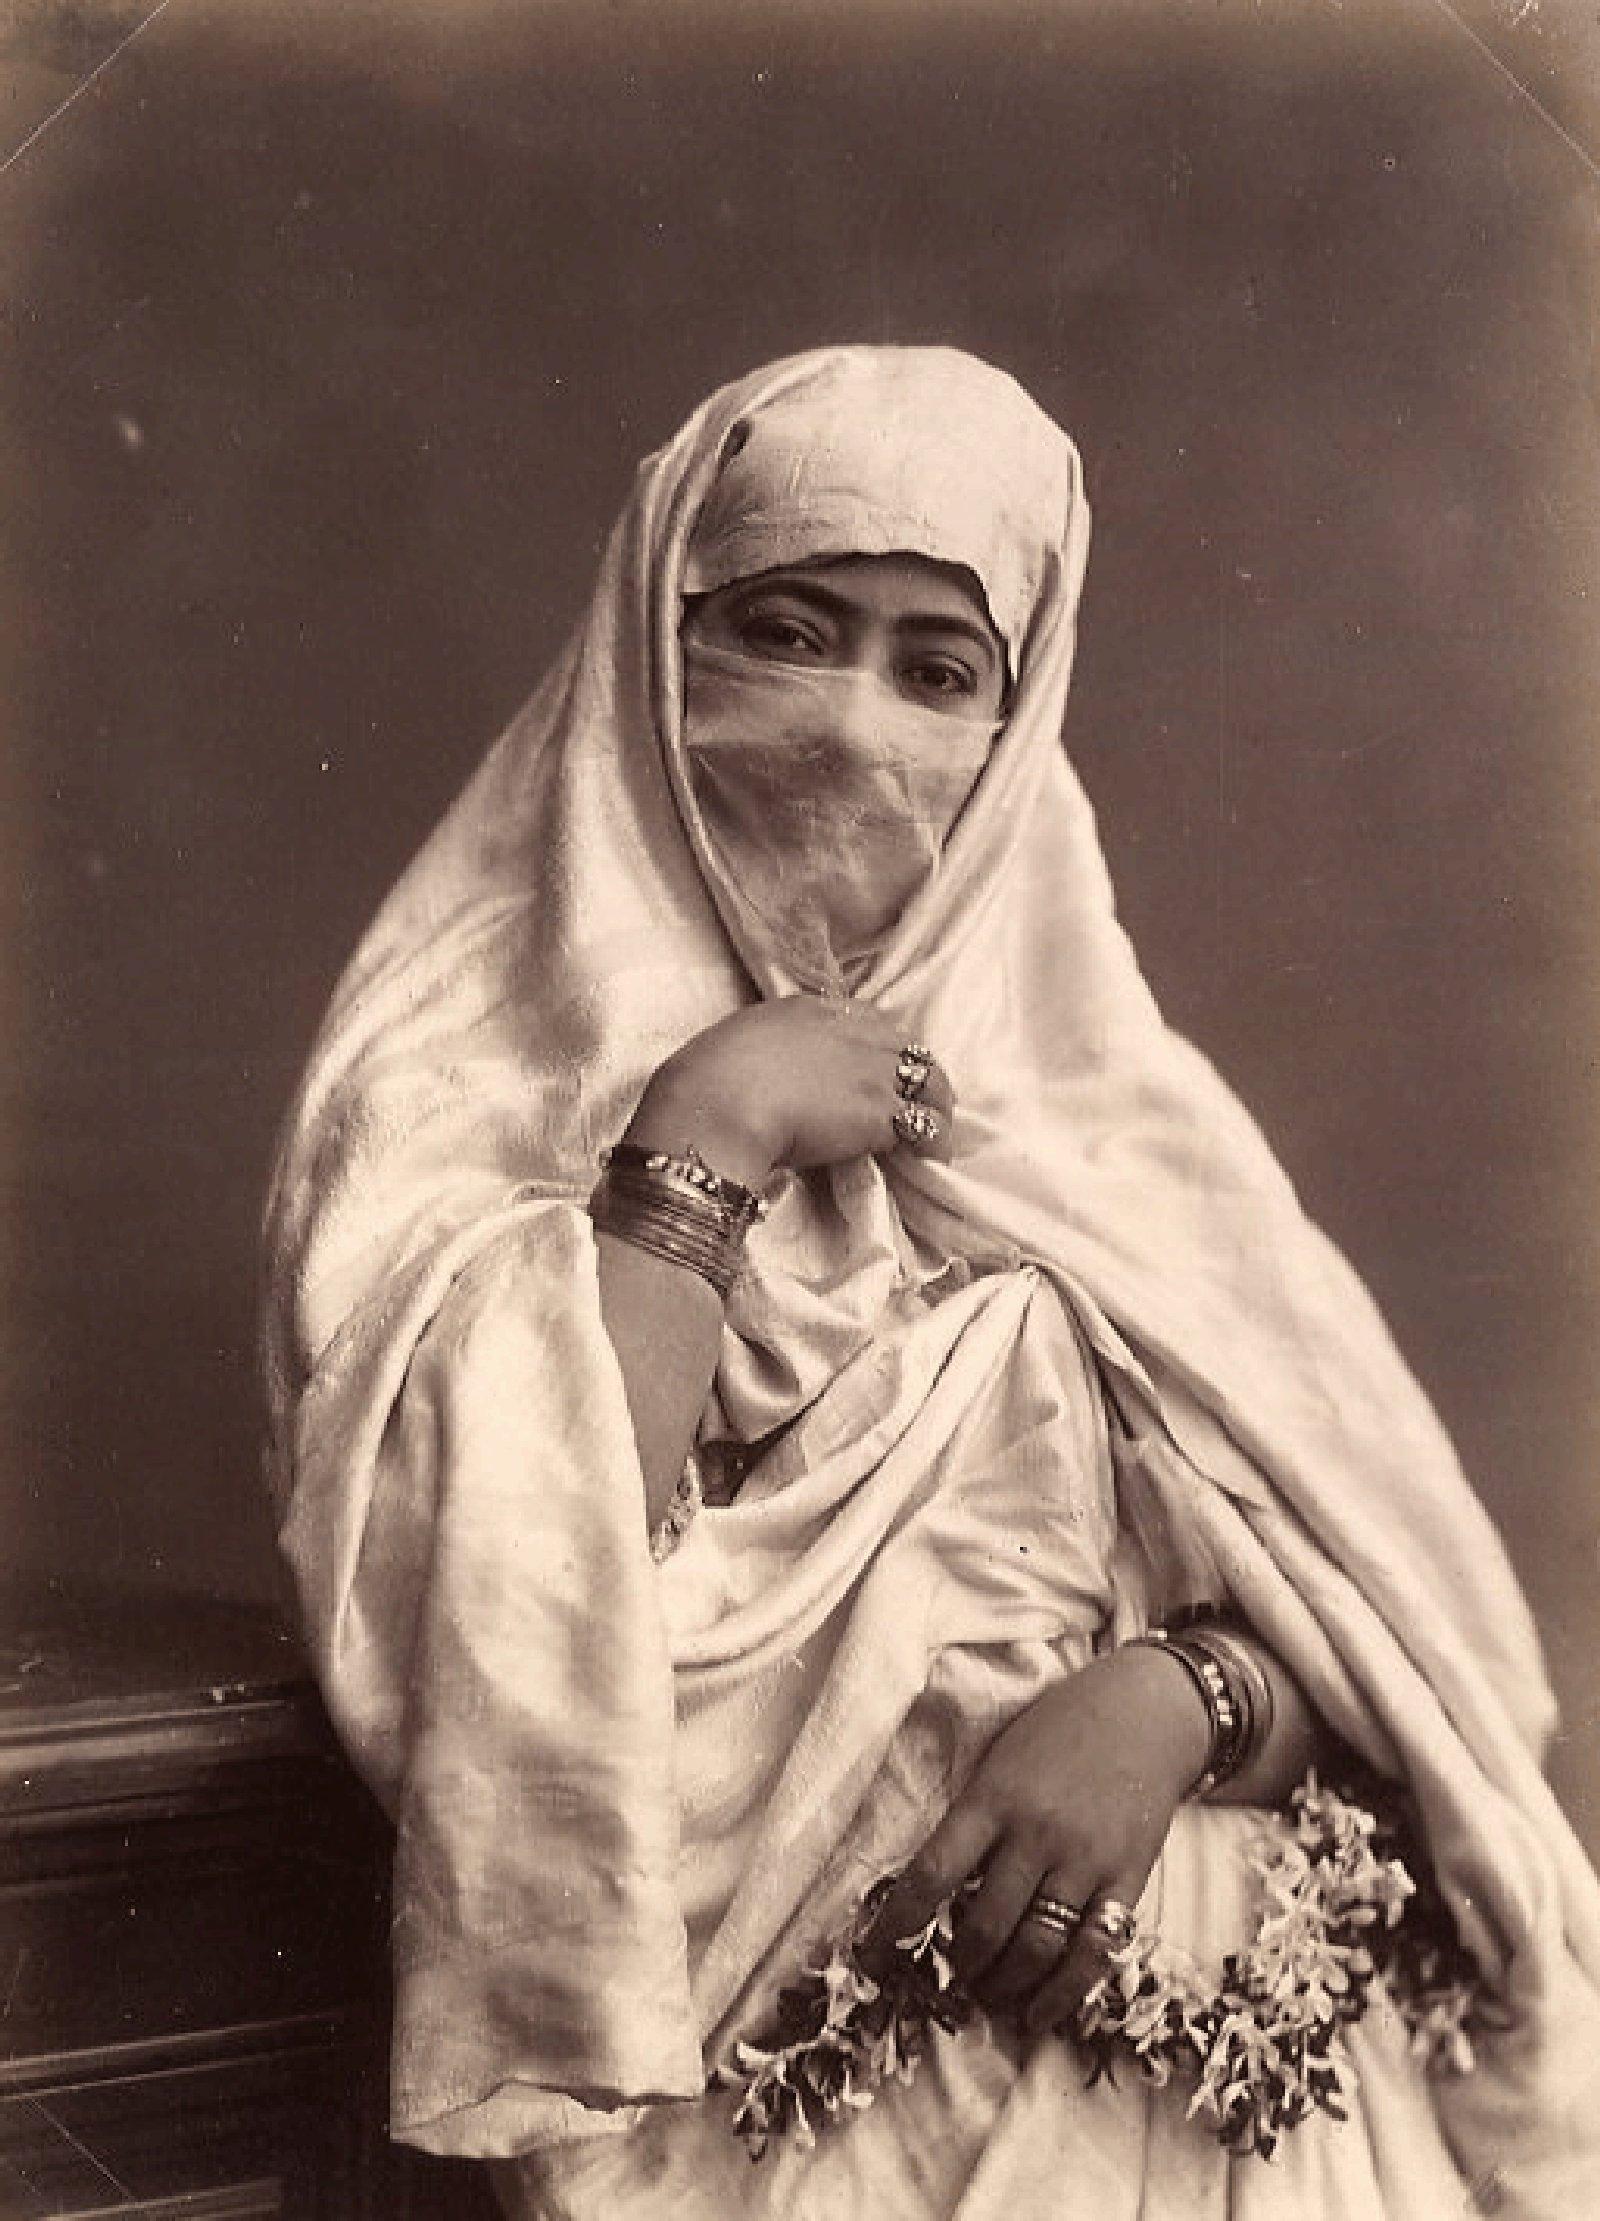 vetement traditionnel algerien femme